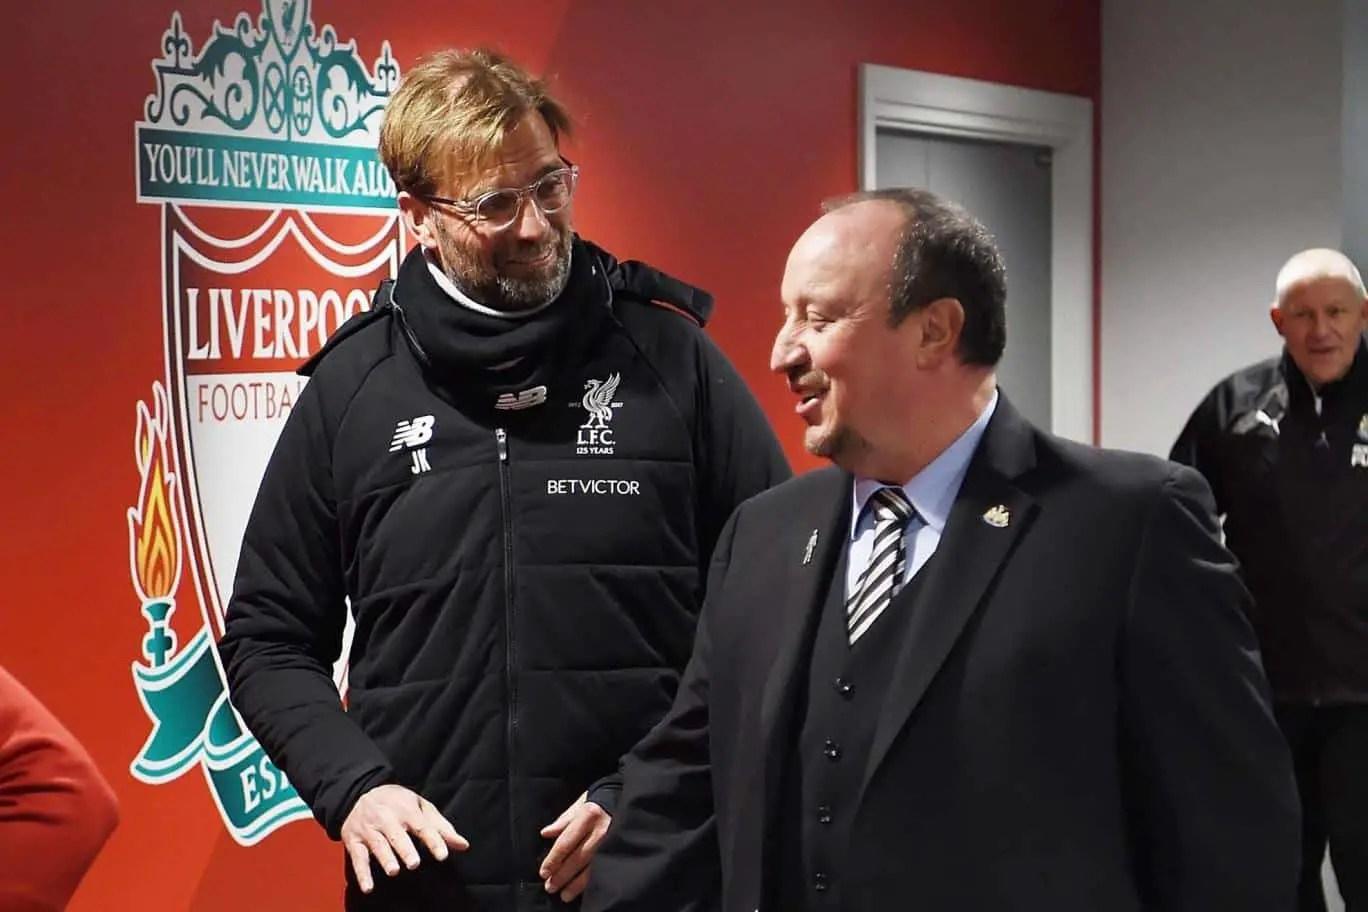 Liverpool 4-0 Newcastle United – As it happened & social media updates